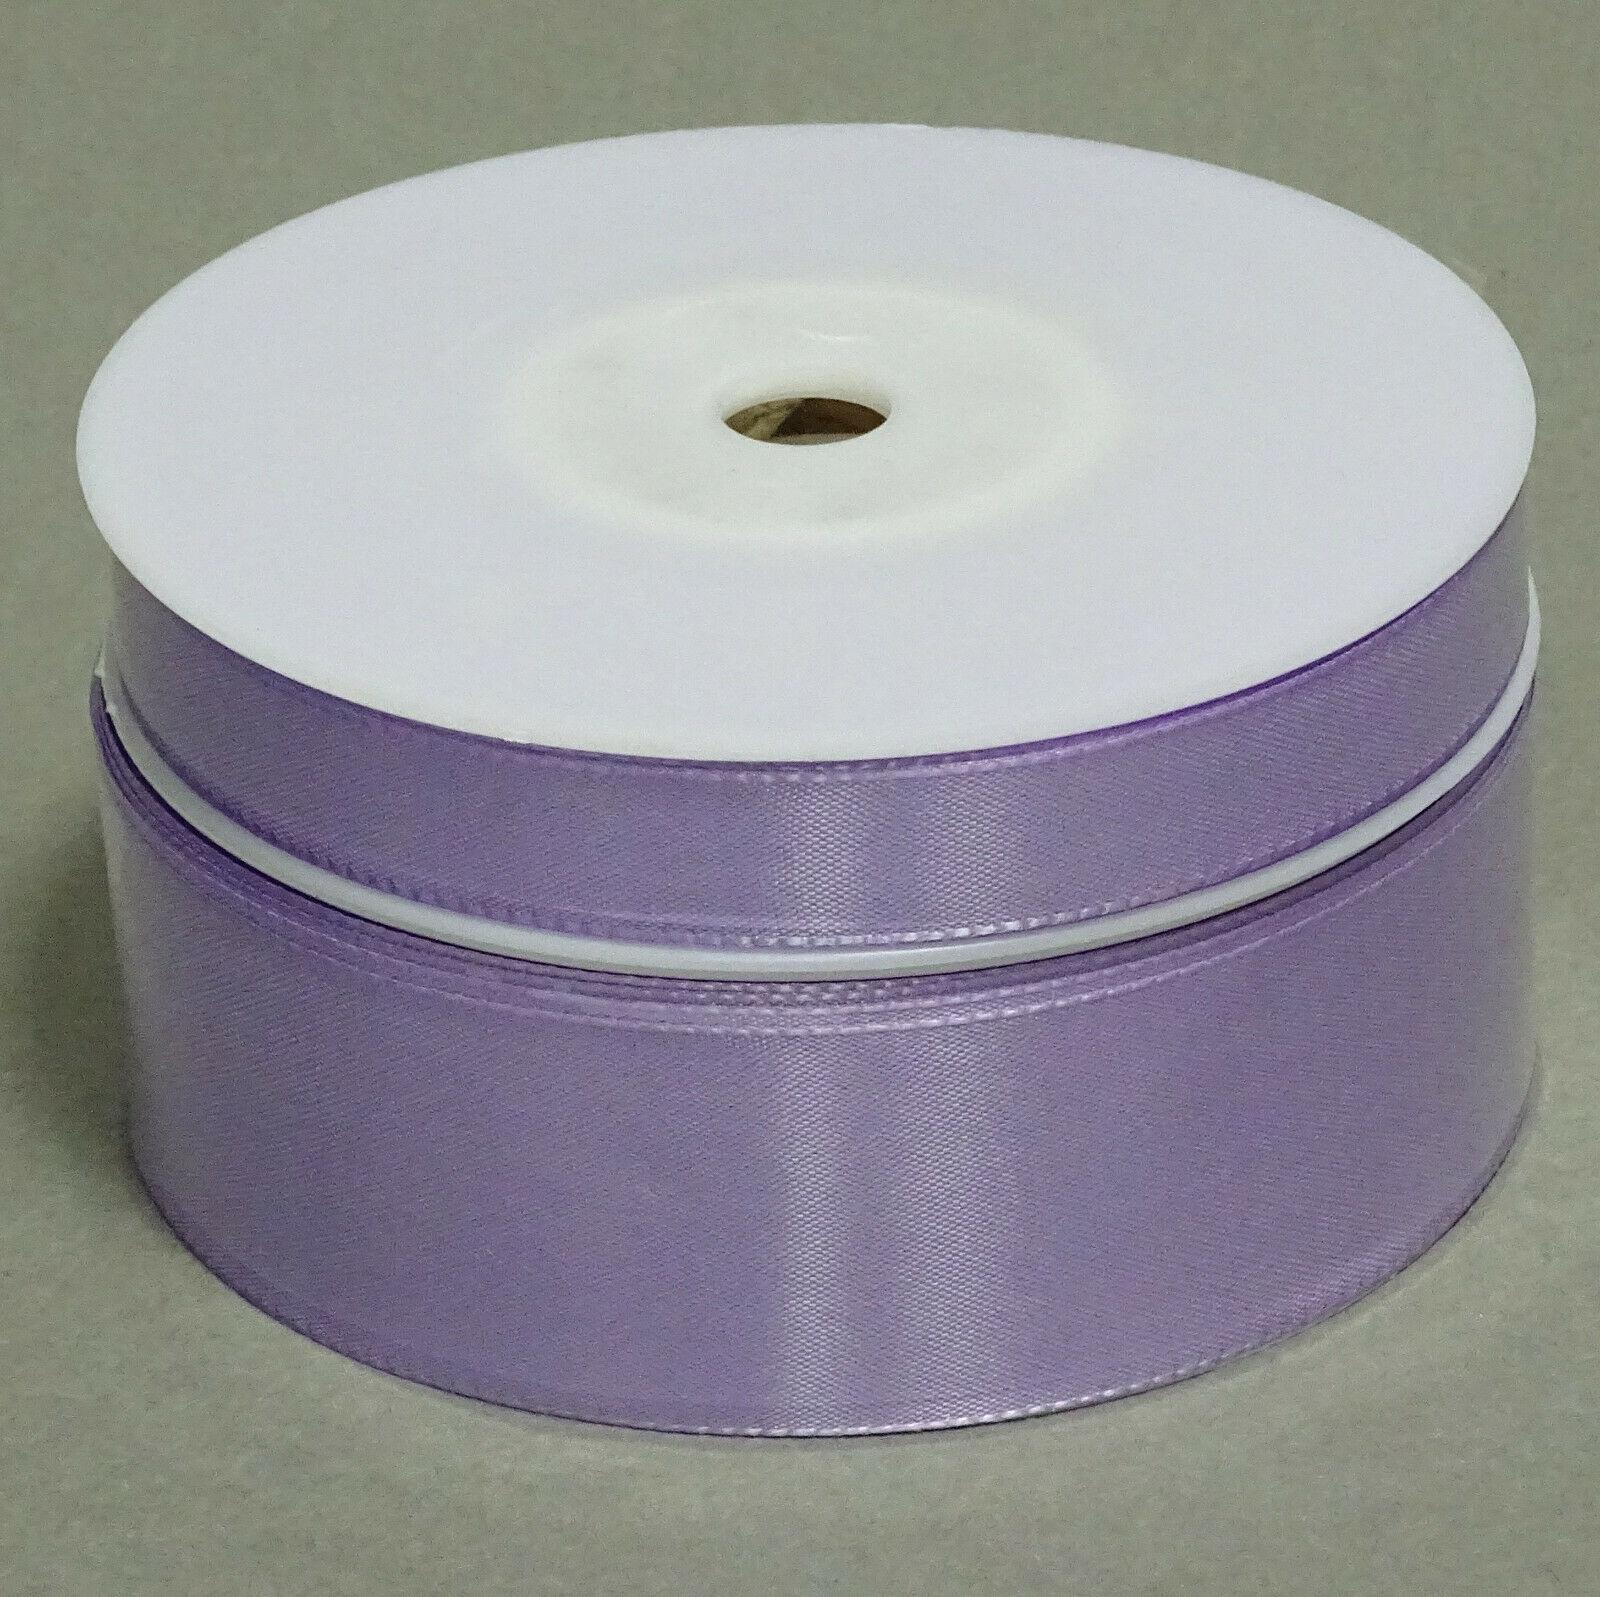 Seidenband Schleifenband 50 m x 15 mm / 40 mm Dekoband ab 0,08 €/m Geschenkband  - Flieder 114, 15 mm x 50 m